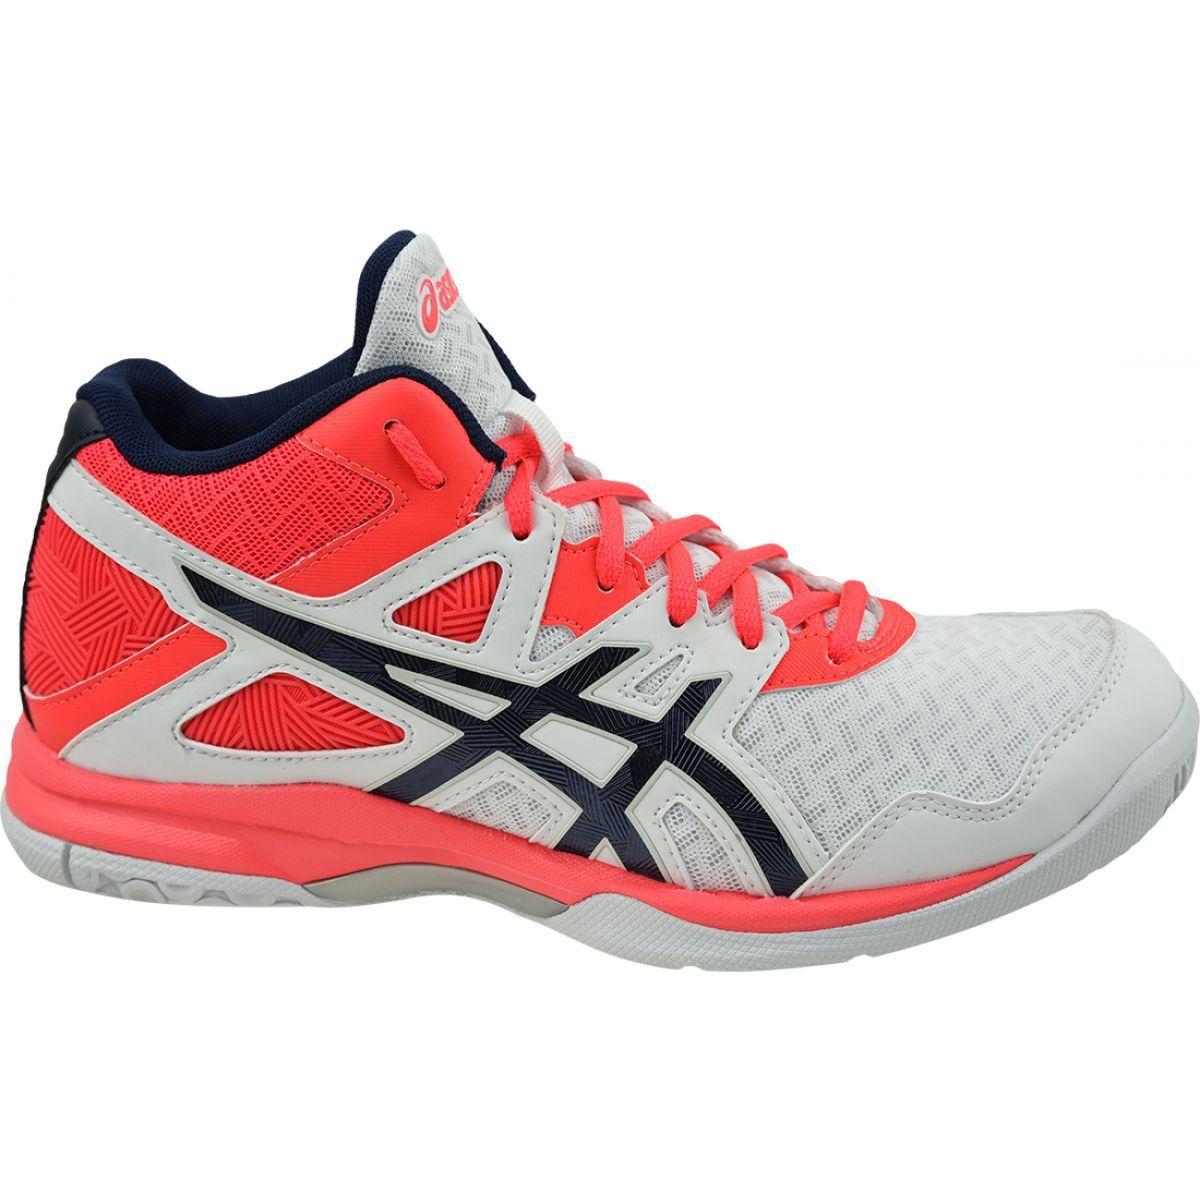 Buty Asics Gel Task Mt 2 M 1072a037 101 Biale Wielokolorowe Asics Asics Gel Asics Shoes